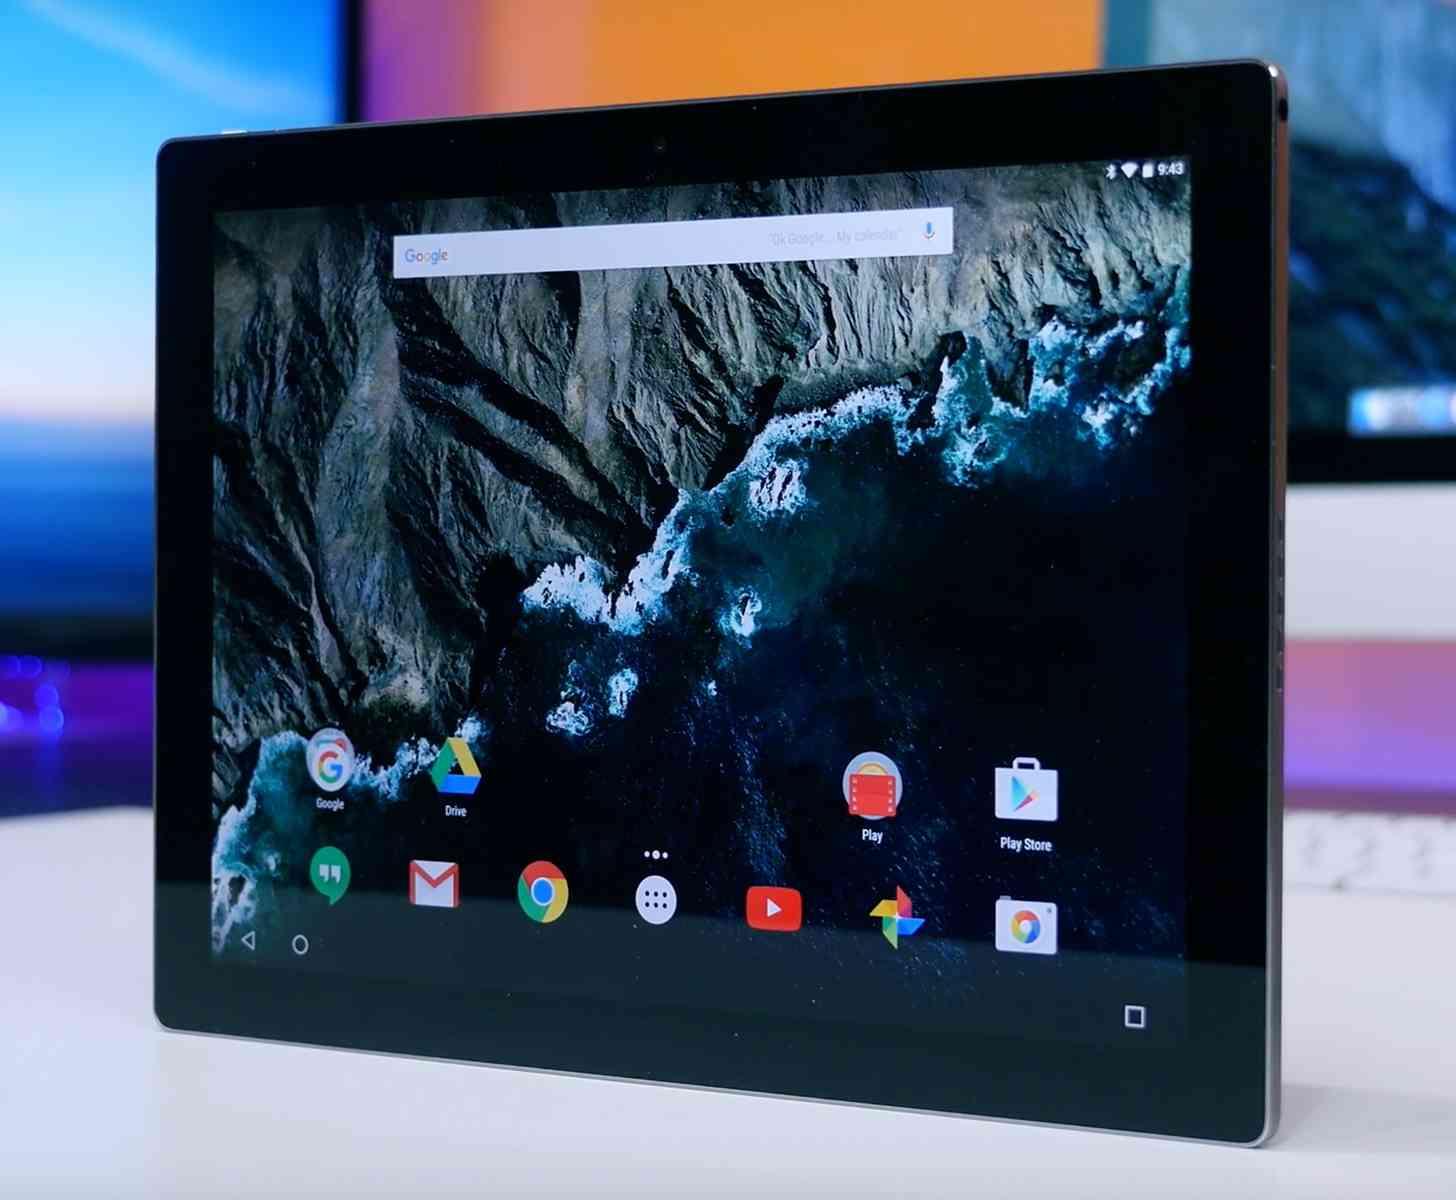 Google Pixel C hands-on review